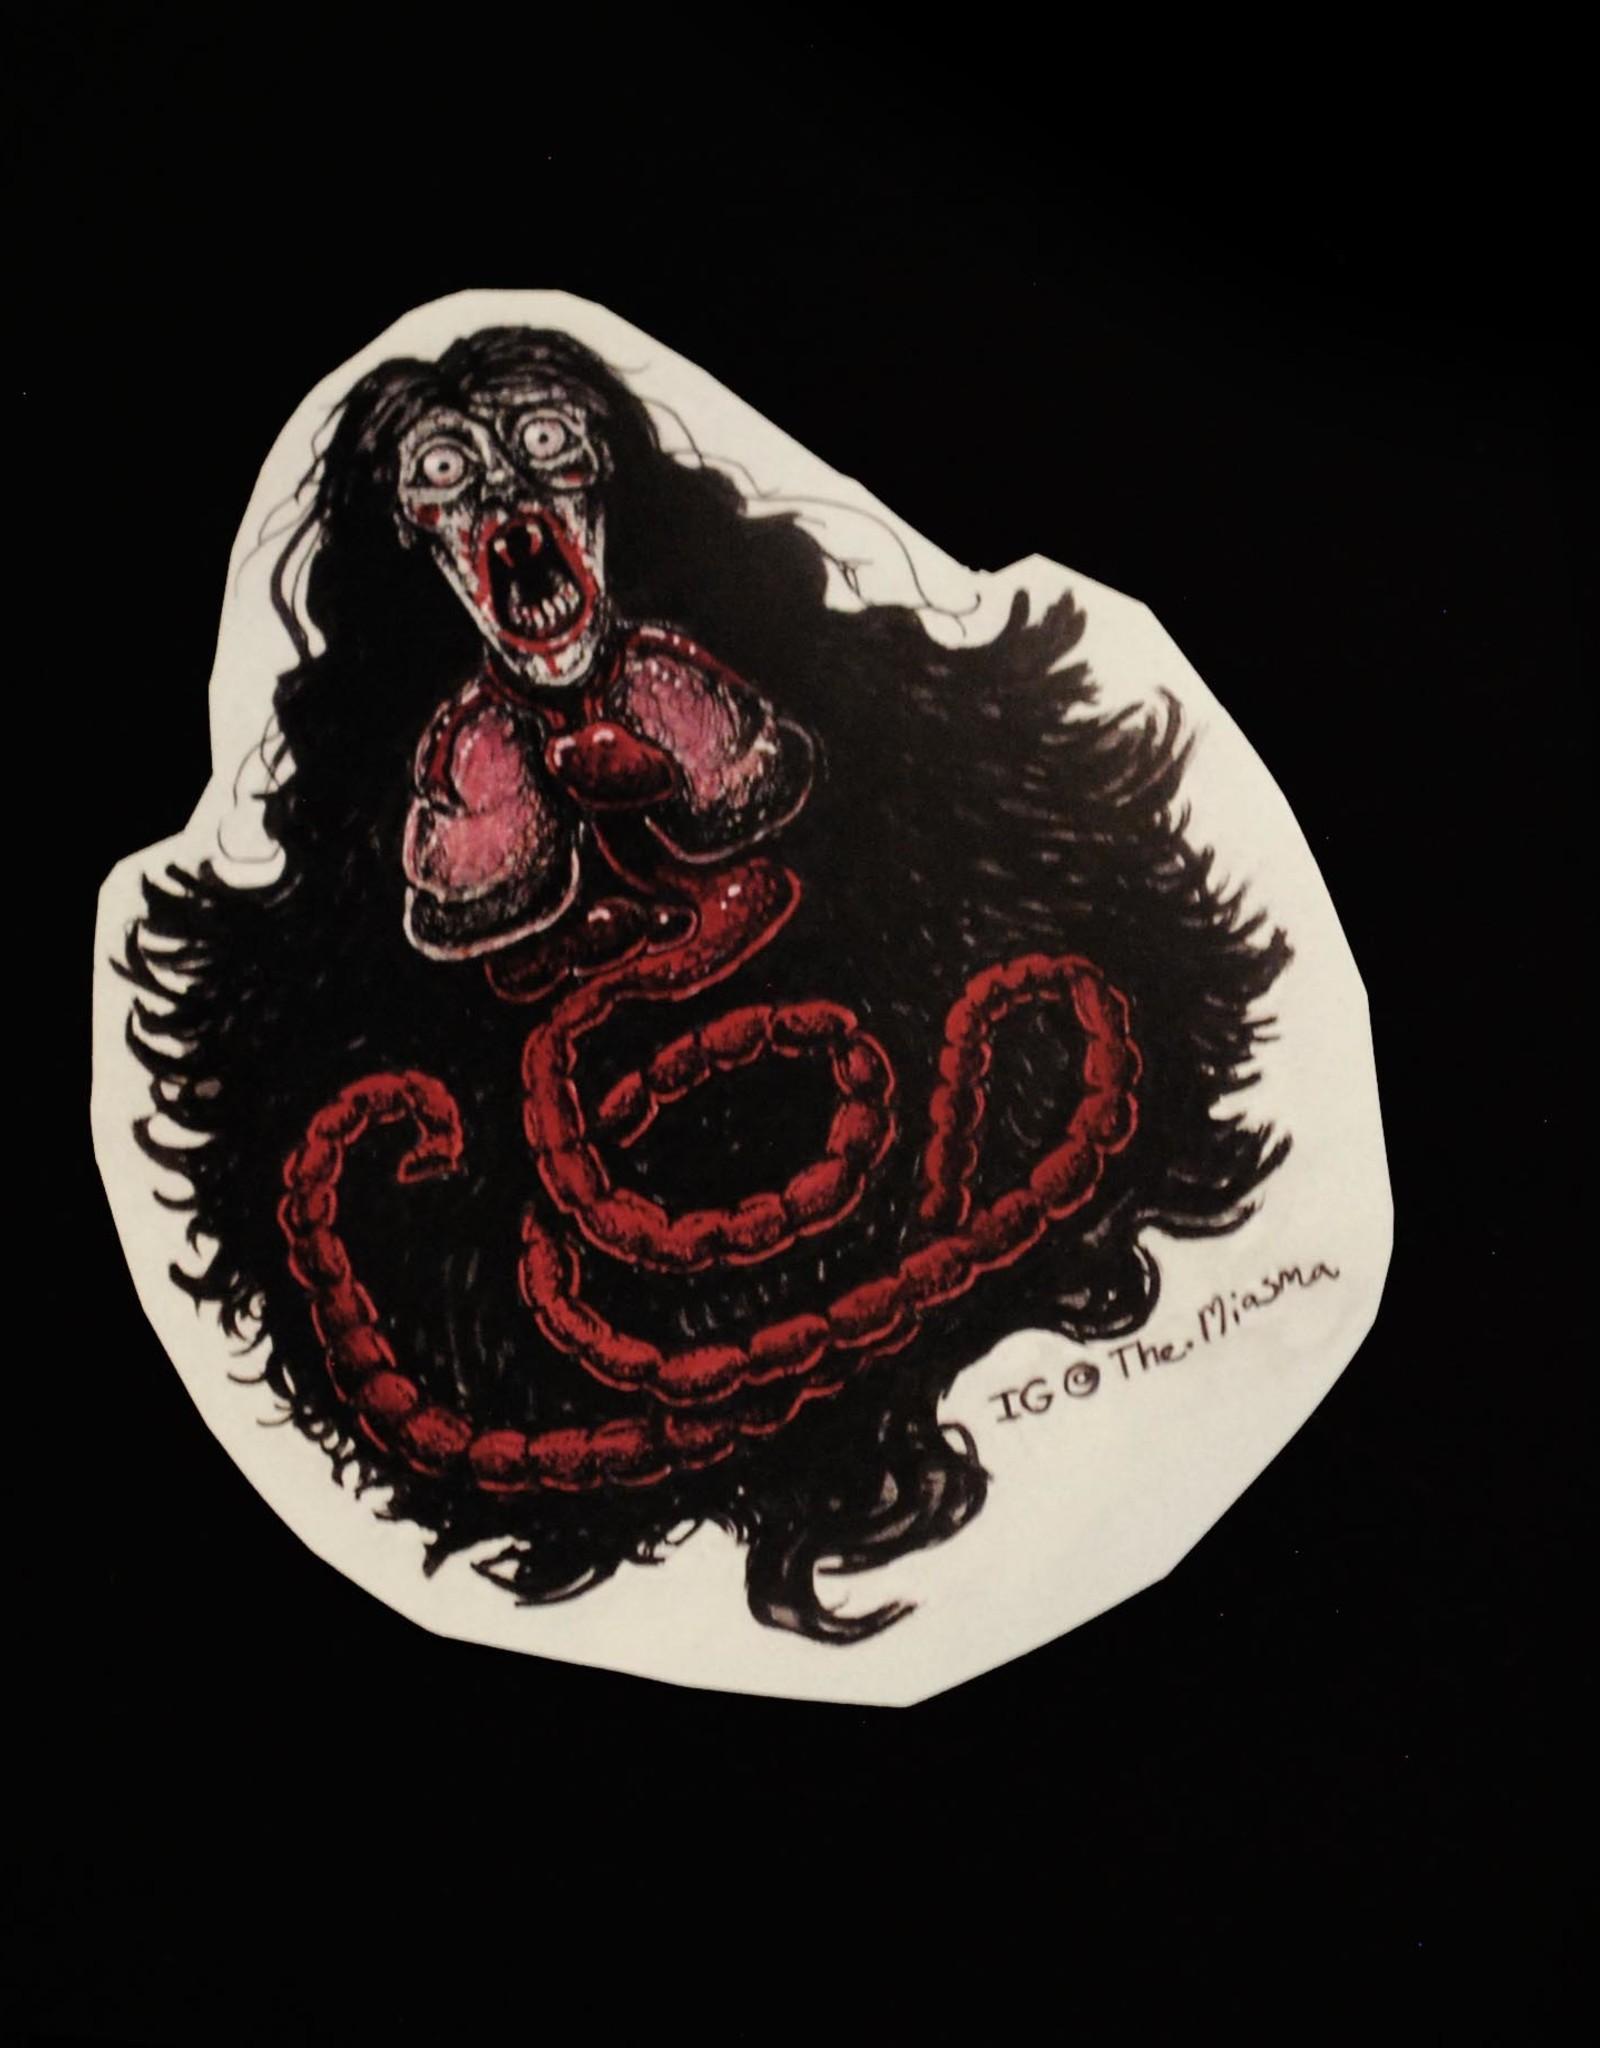 """Penanggalan"" red sticker by The Miasma"